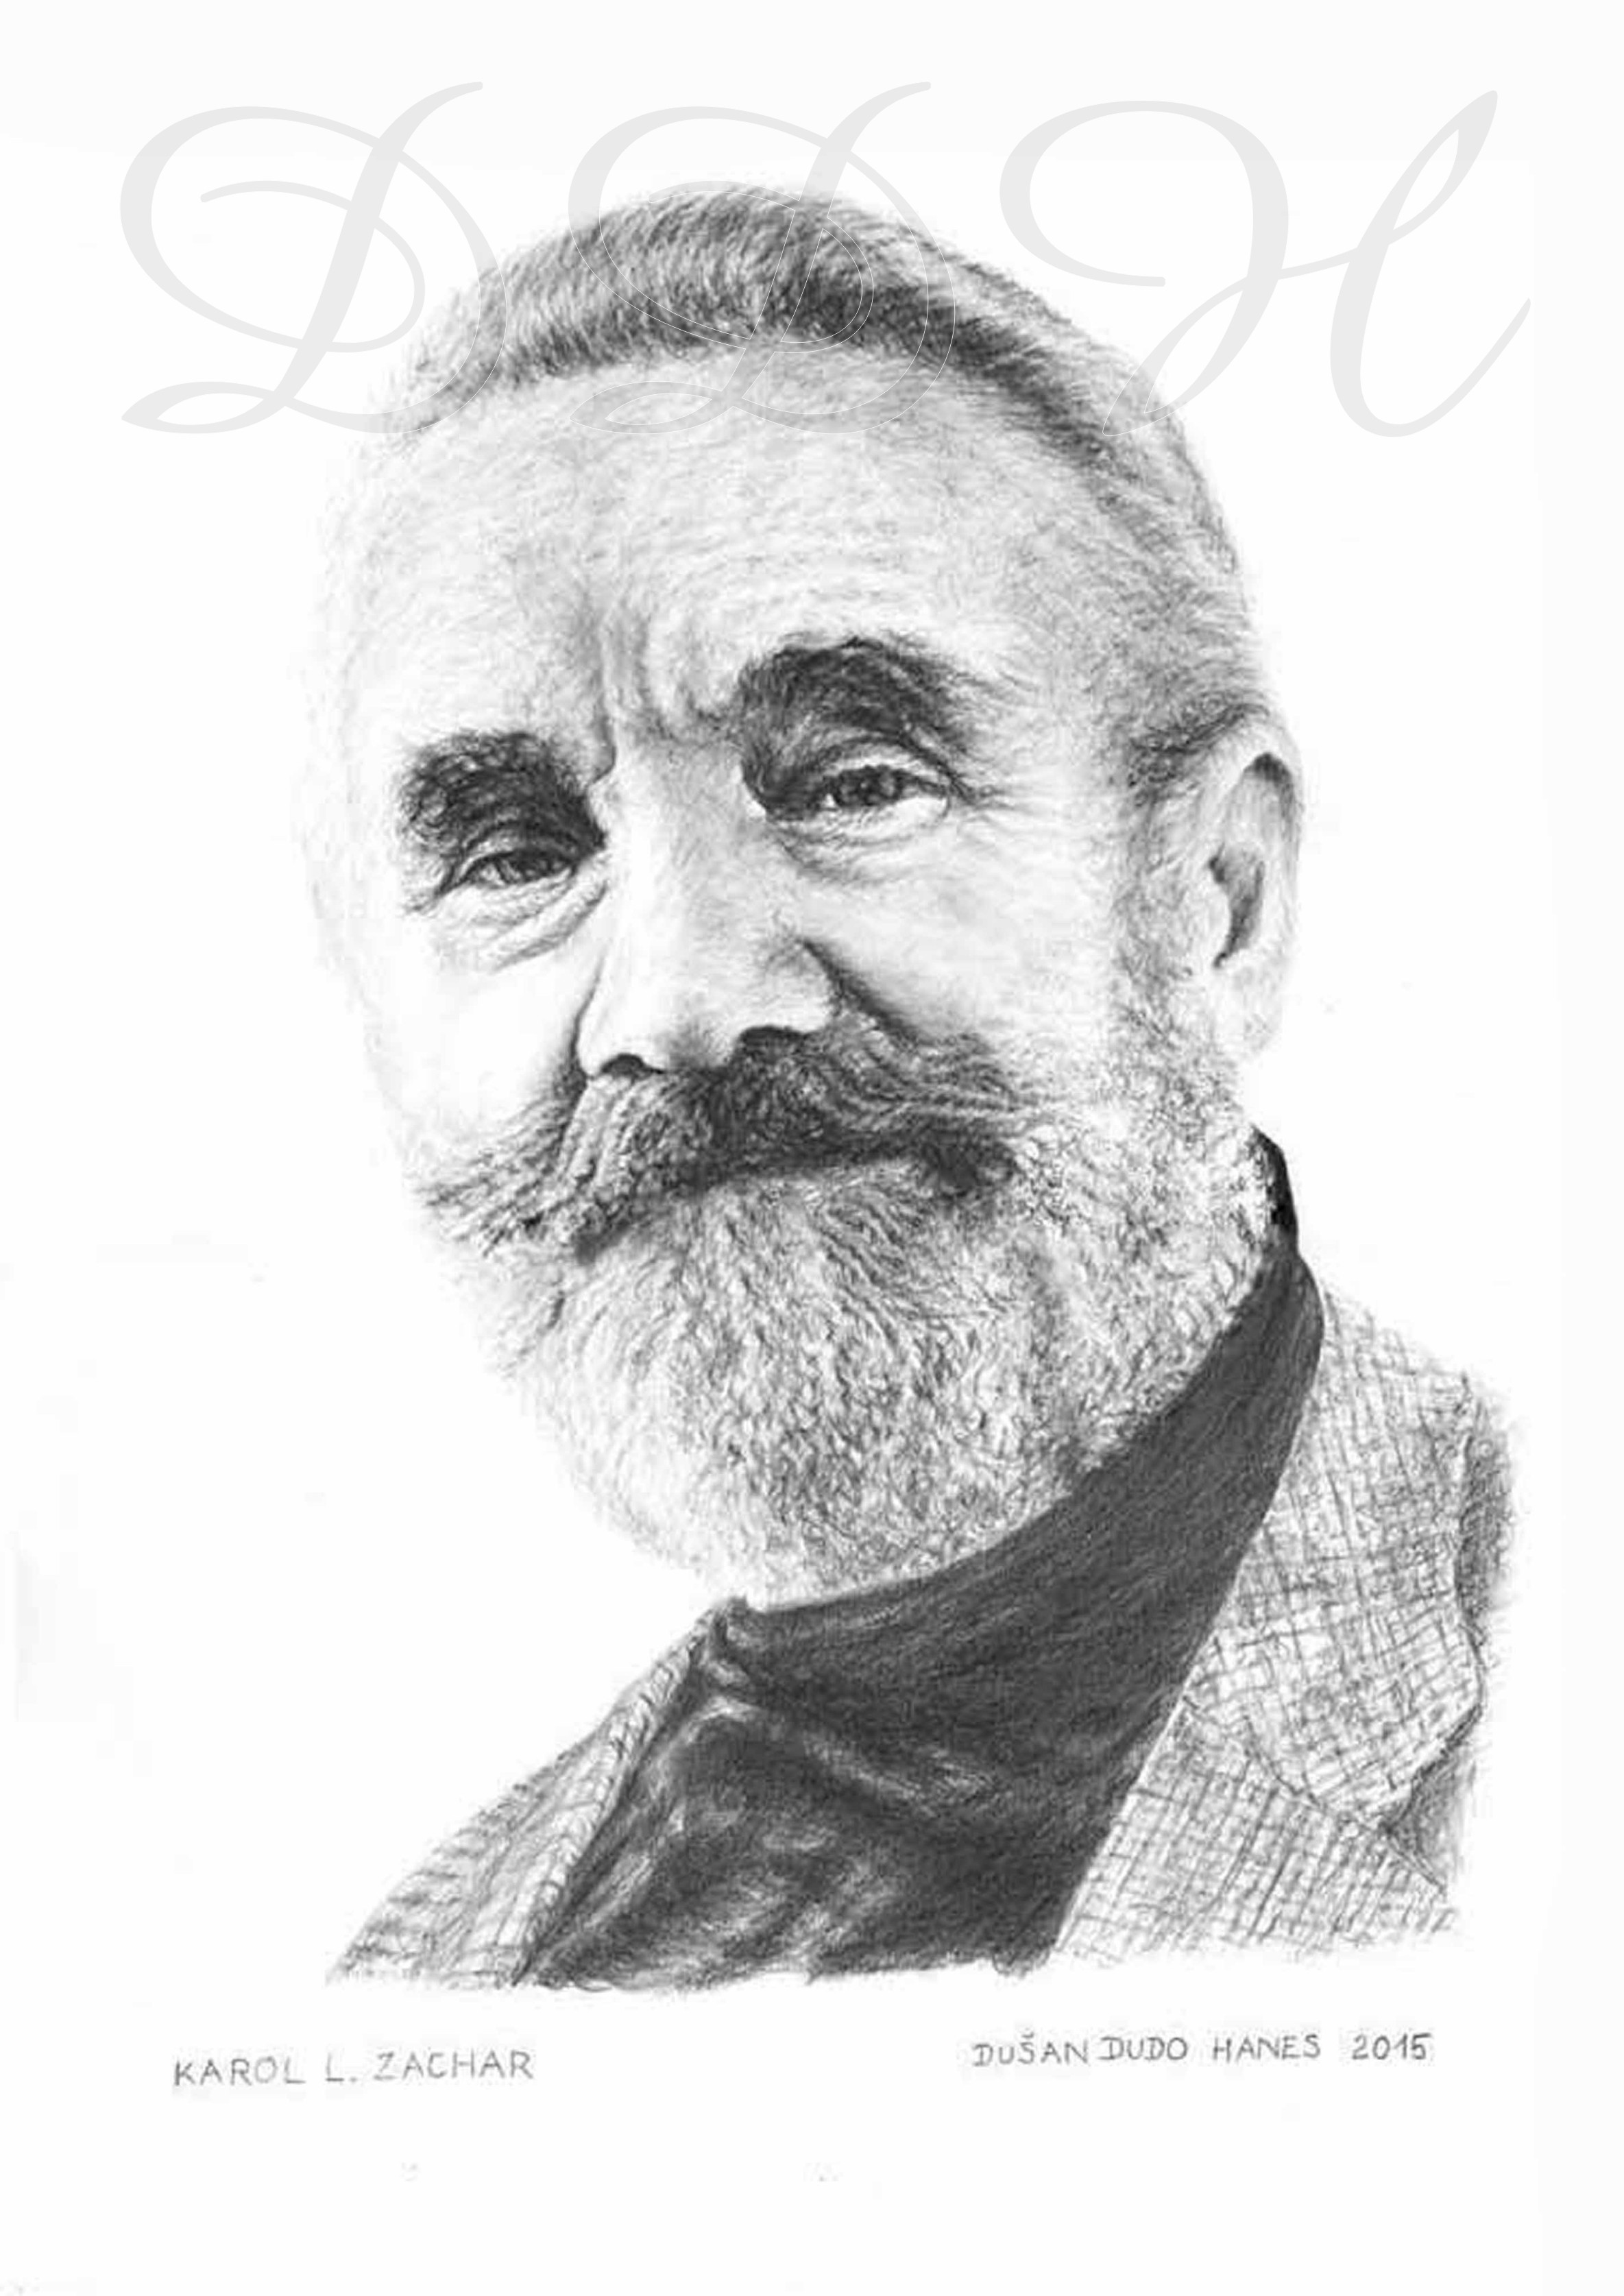 133 - Karol L. Zachar, portrét Dušan Dudo Hanes